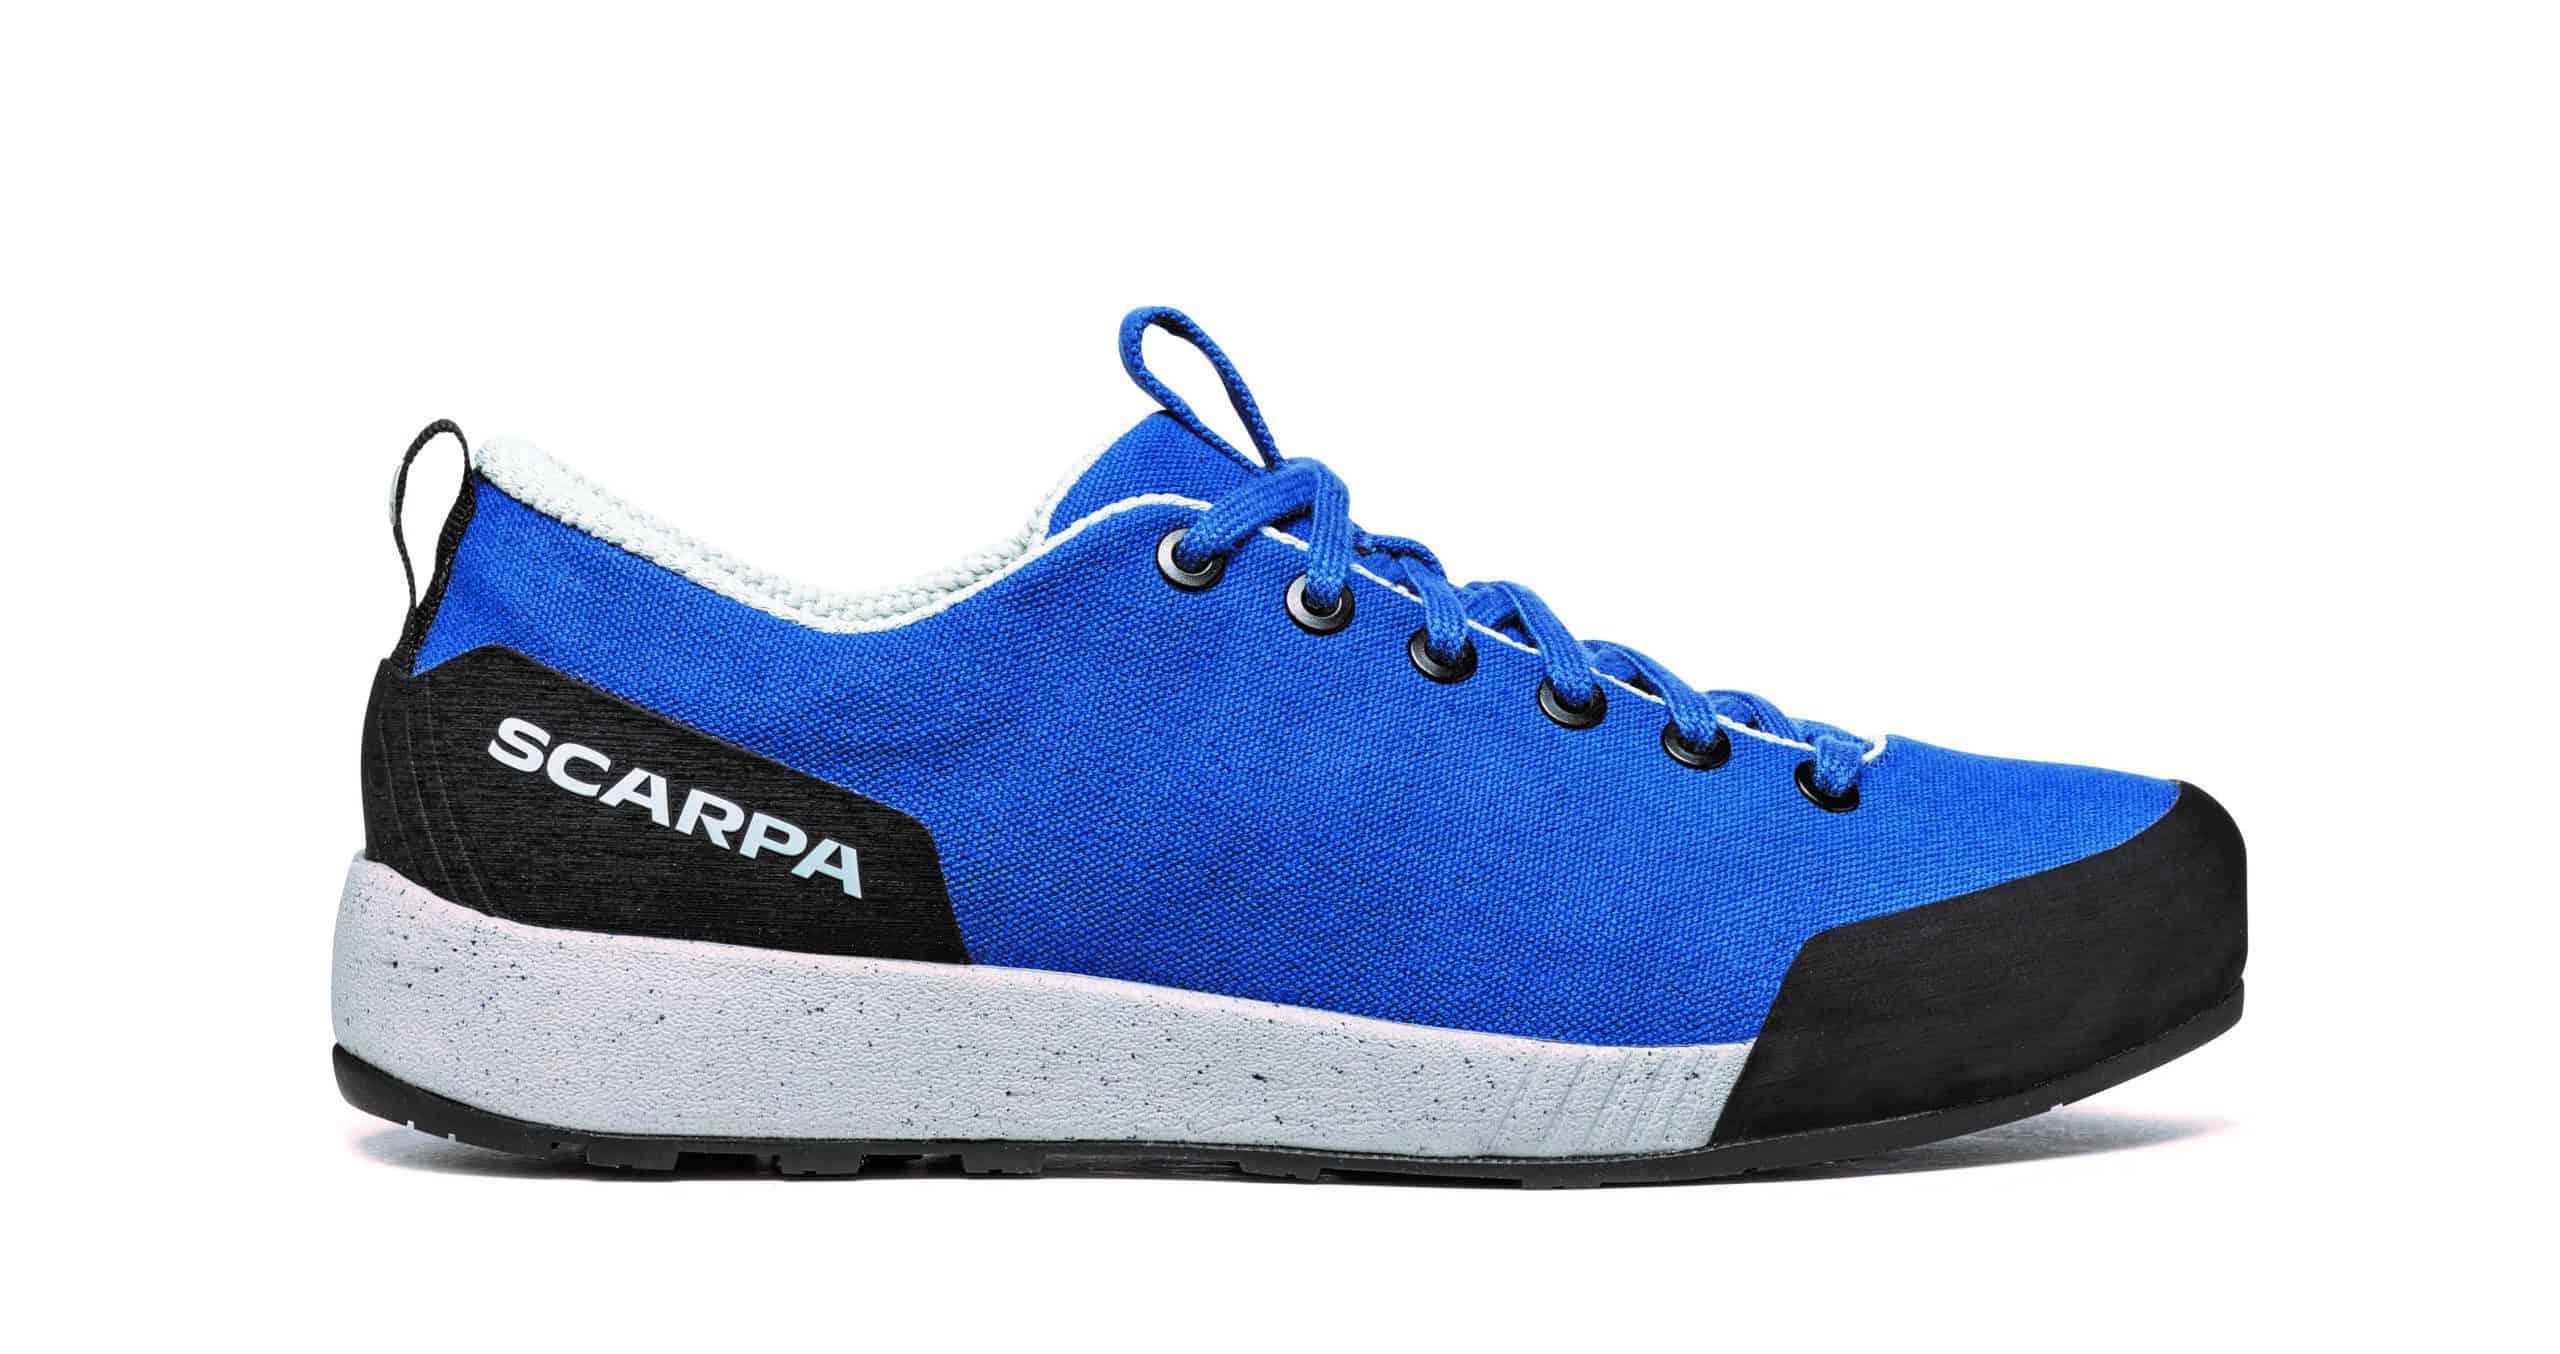 Scarpa Spirit - blue